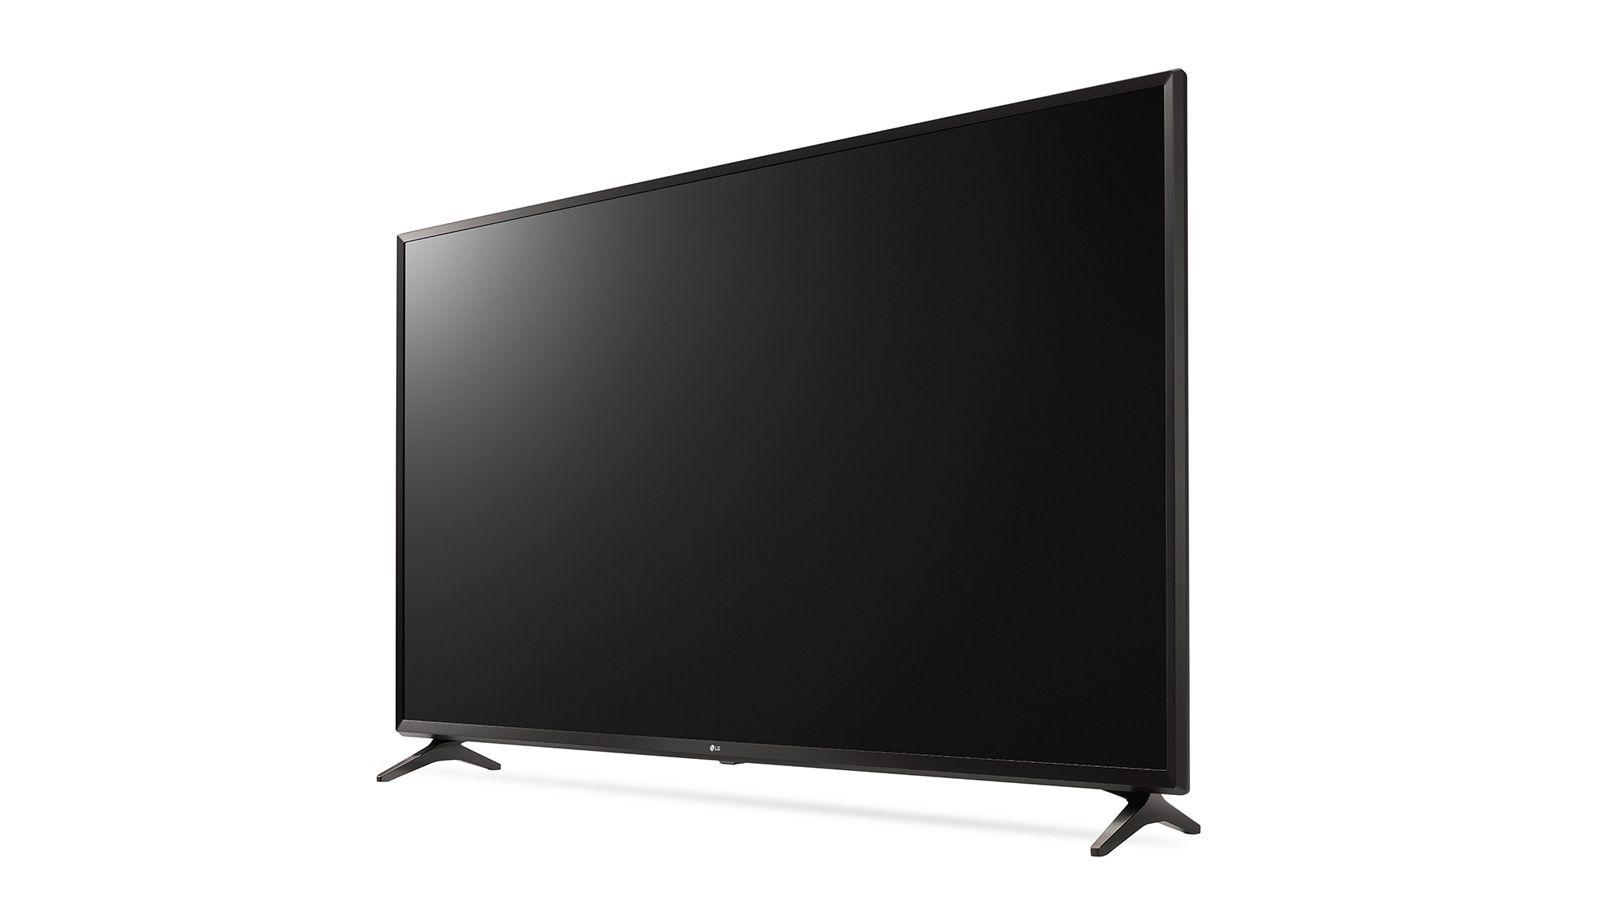 "Smart TV LED 43"" Ultra HD 4K LG 43UJ6300 com Sistema WebOS 3.5, Wi-Fi, Painel IPS, HDR"